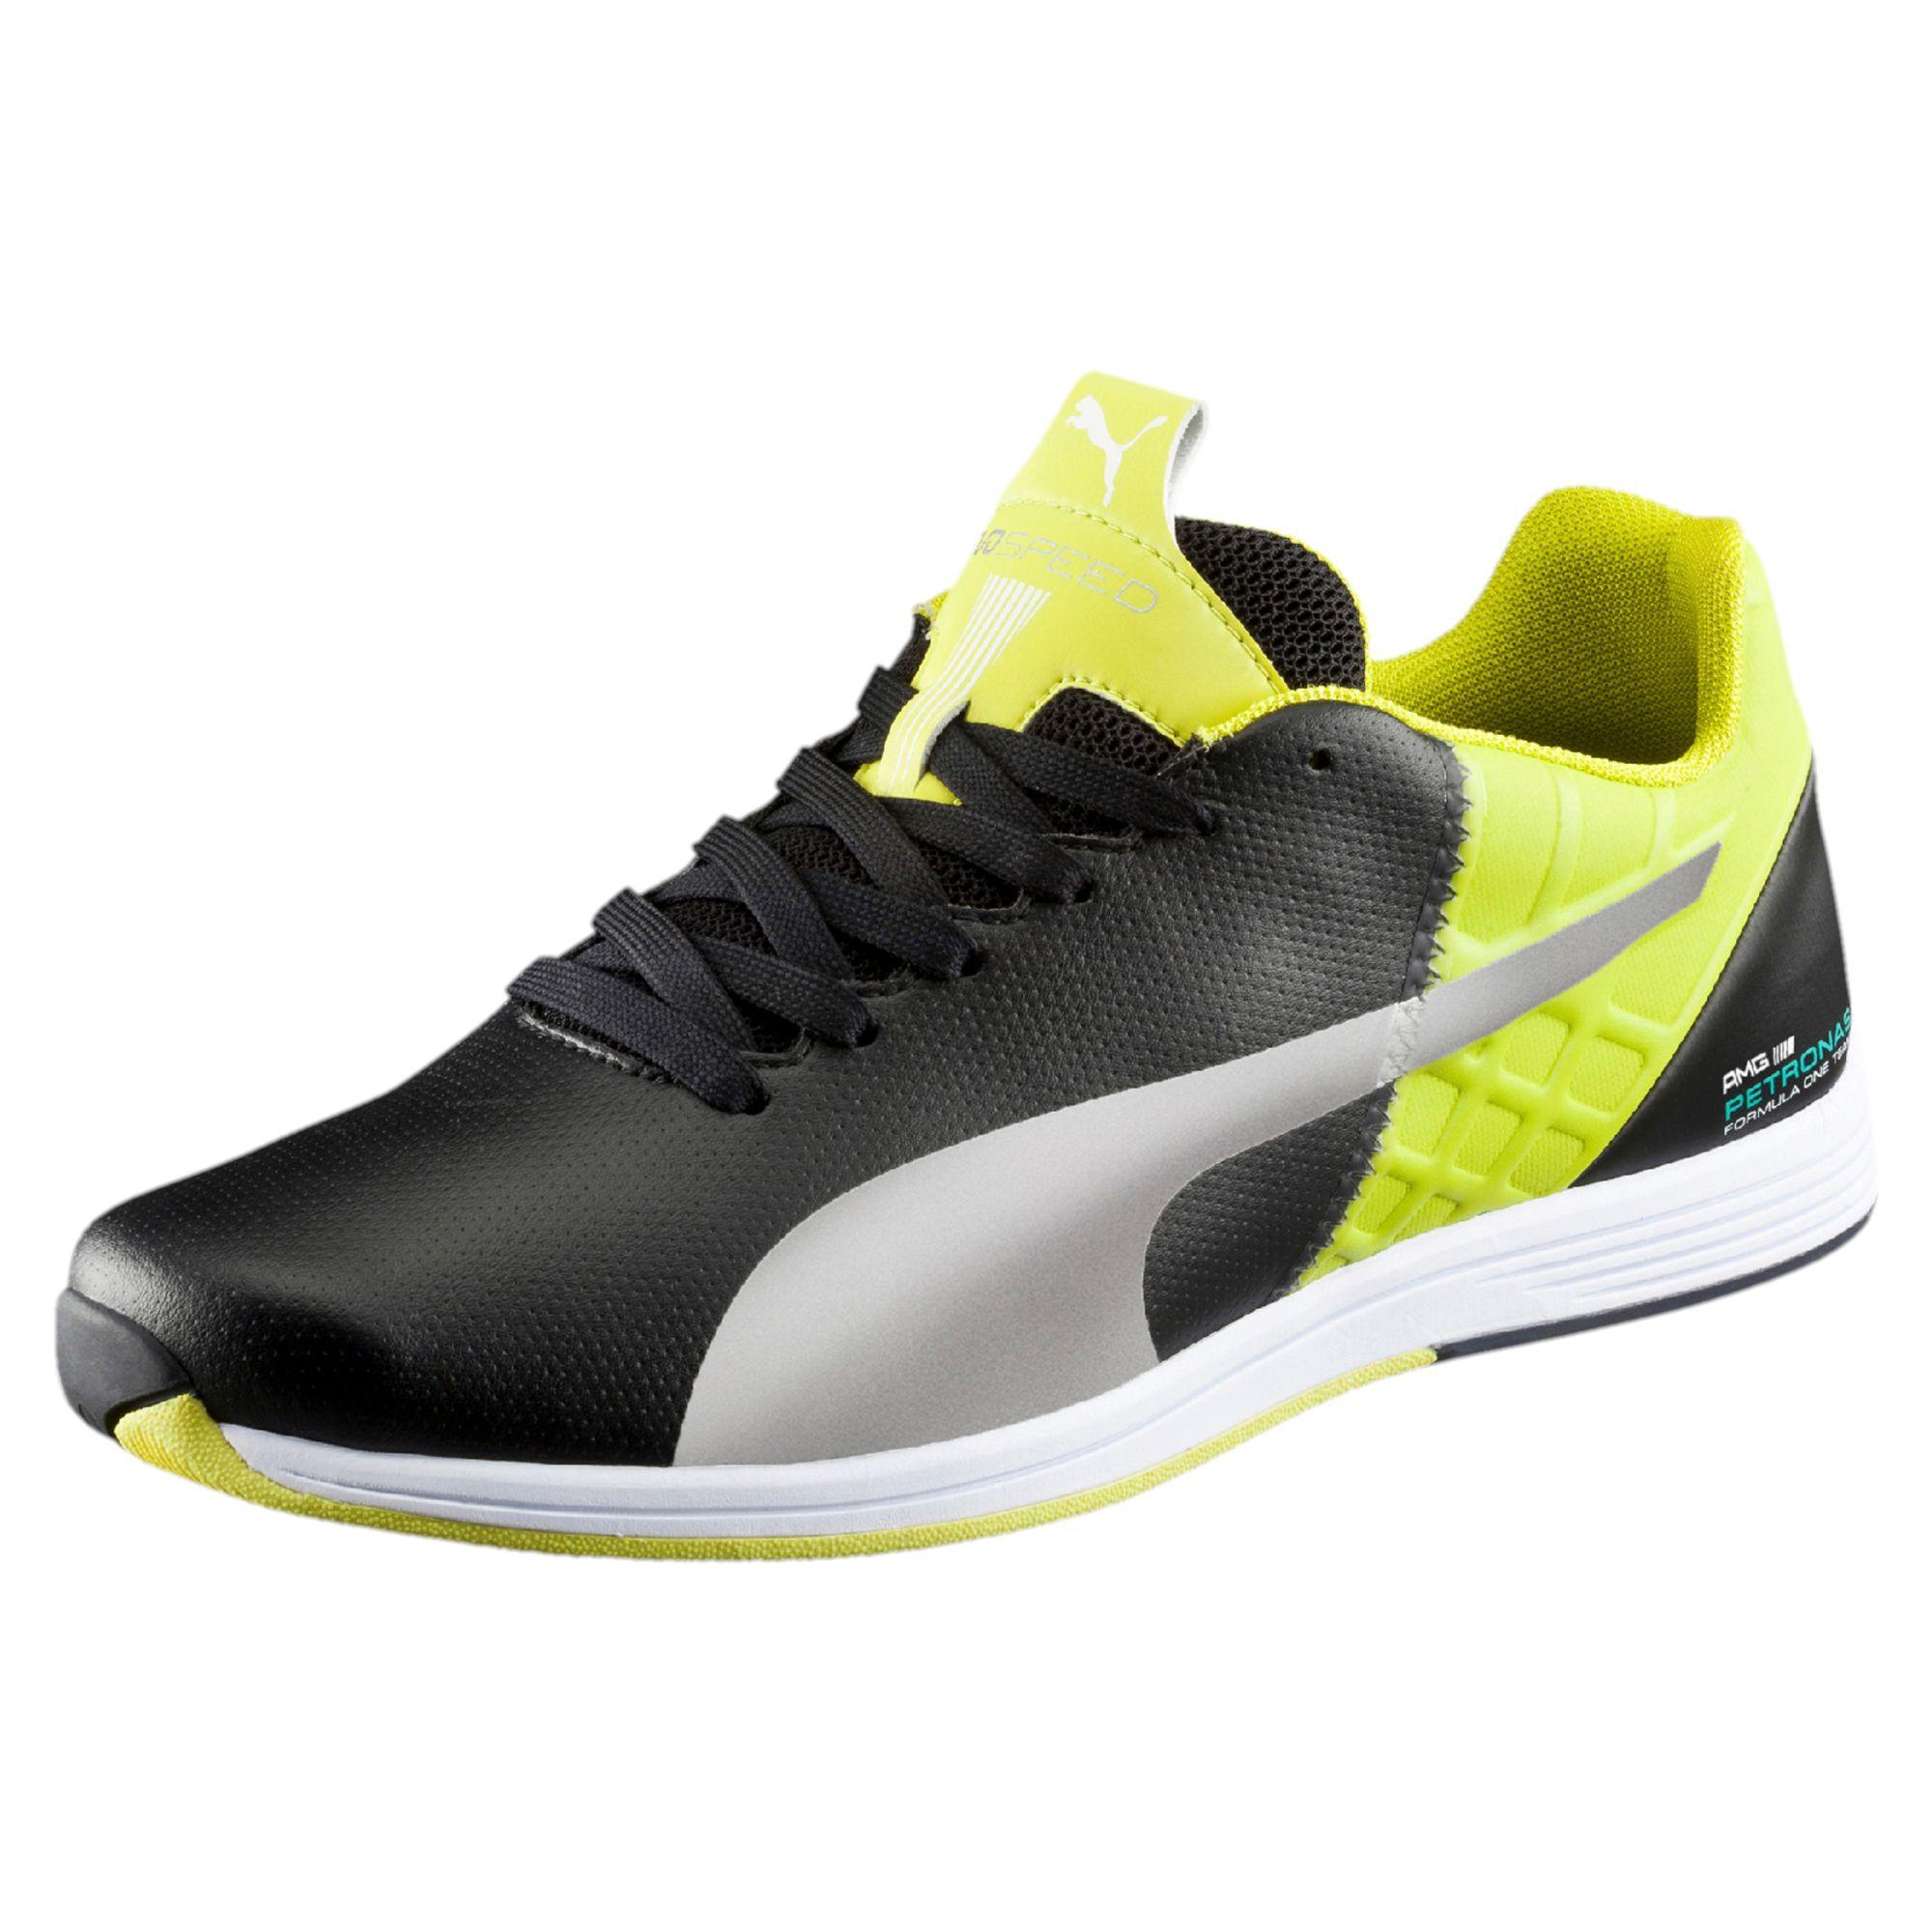 puma mercedes amg petronas evospeed 1 4 sneaker schuhe. Black Bedroom Furniture Sets. Home Design Ideas